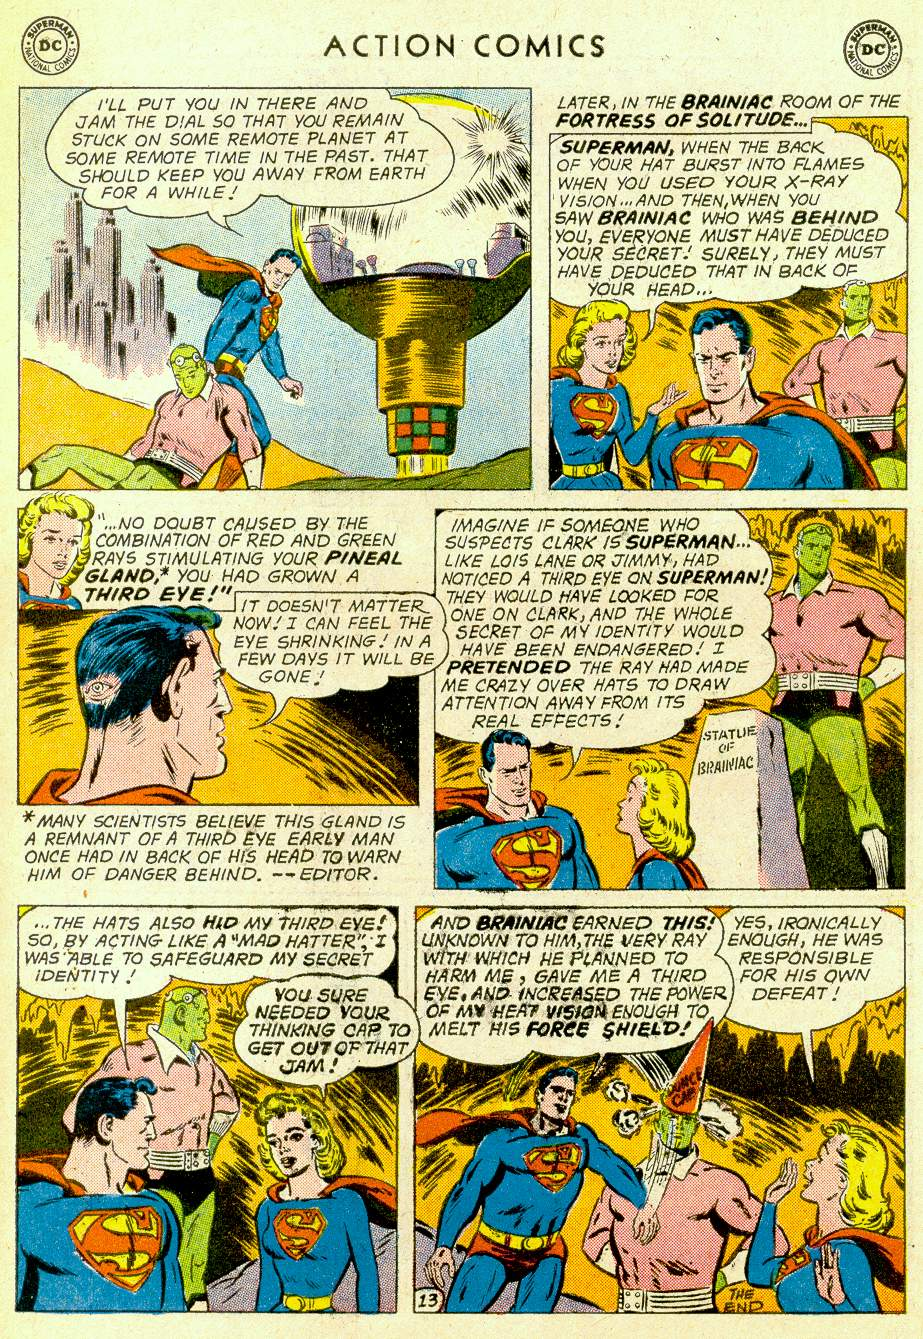 Action Comics (1938) 275 Page 14